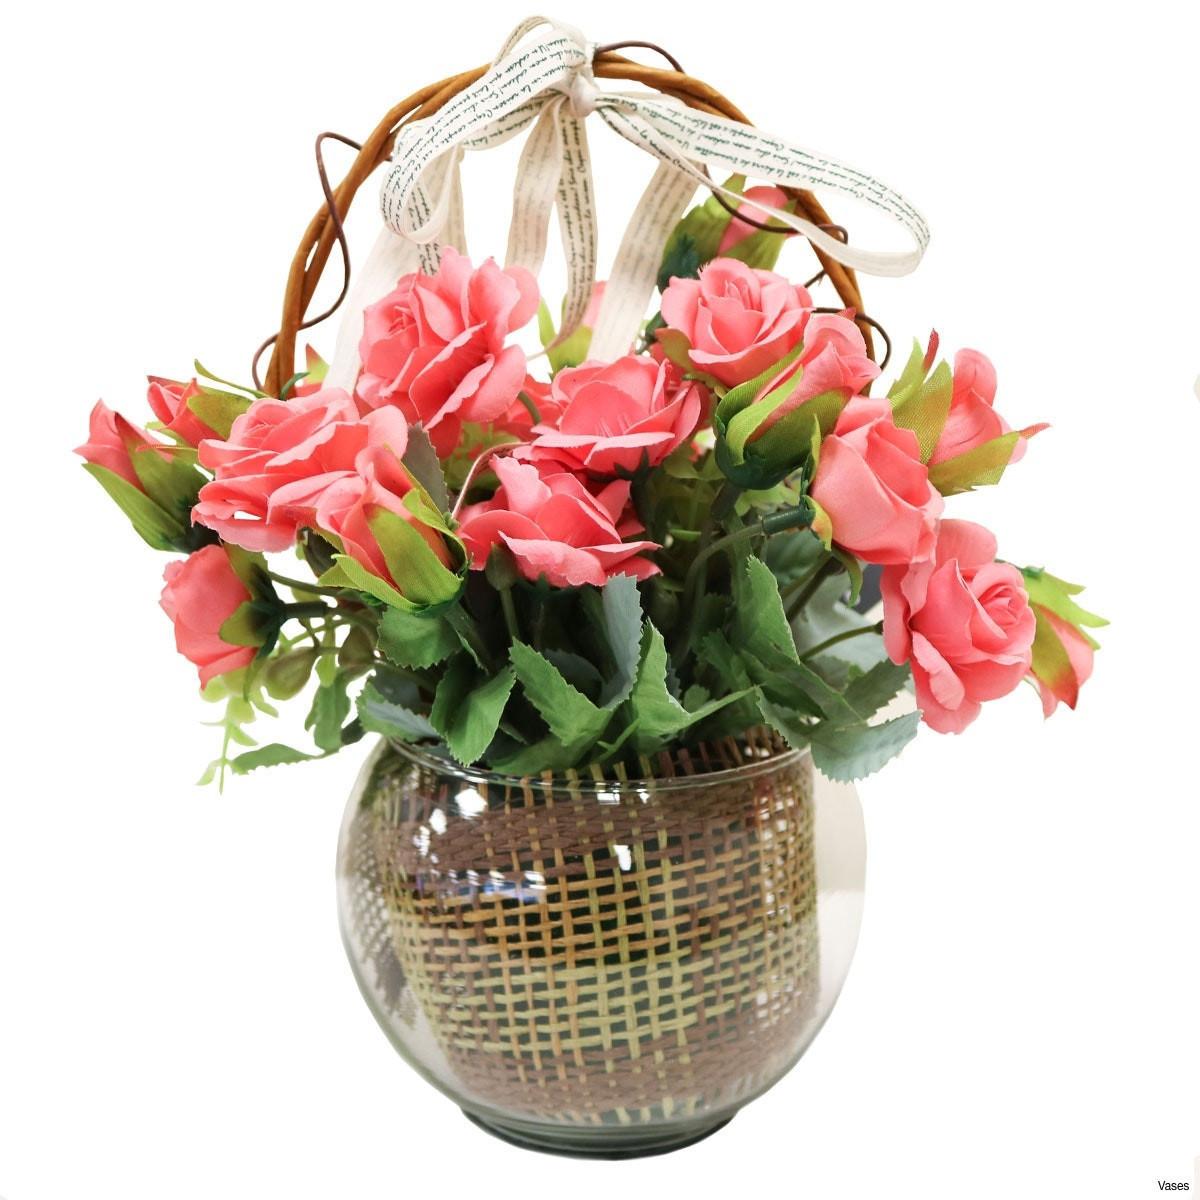 artificial flowers without vase of 30 elegant flower basket decoration flower decoration ideas throughout bf142 11km 1200x1200h vases pink flower vase i 0d gold inspiration